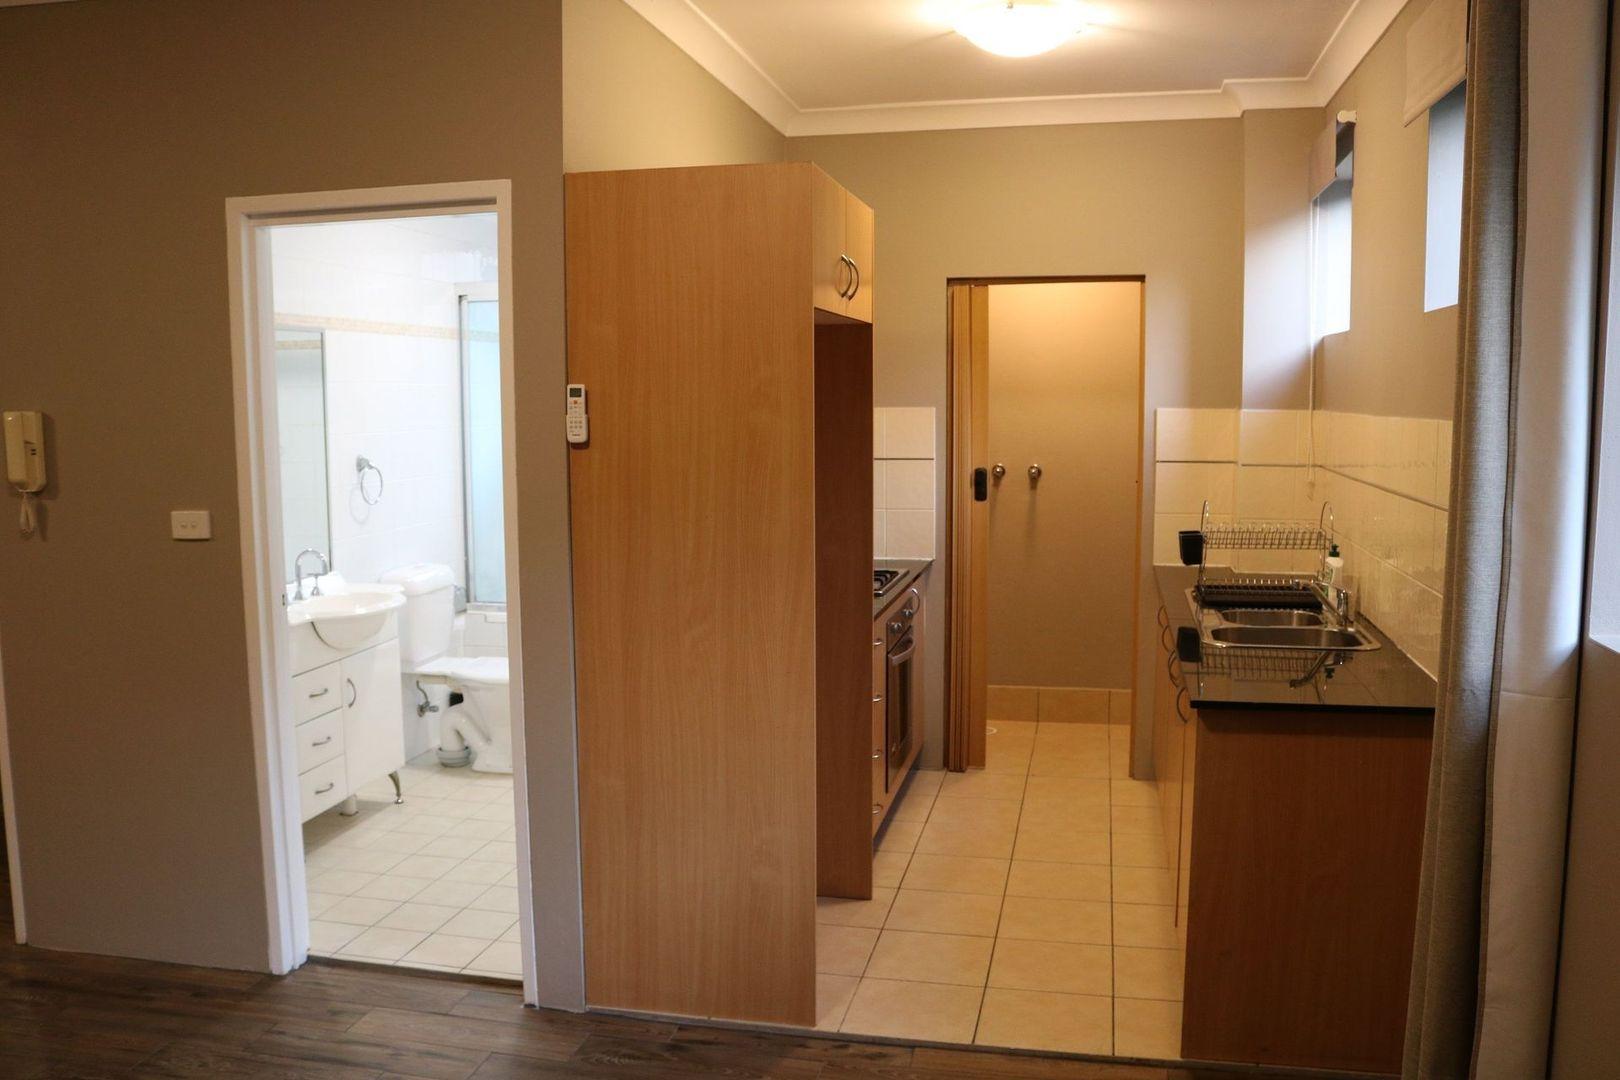 14/43-49 Bowden Street, Harris Park NSW 2150, Image 1